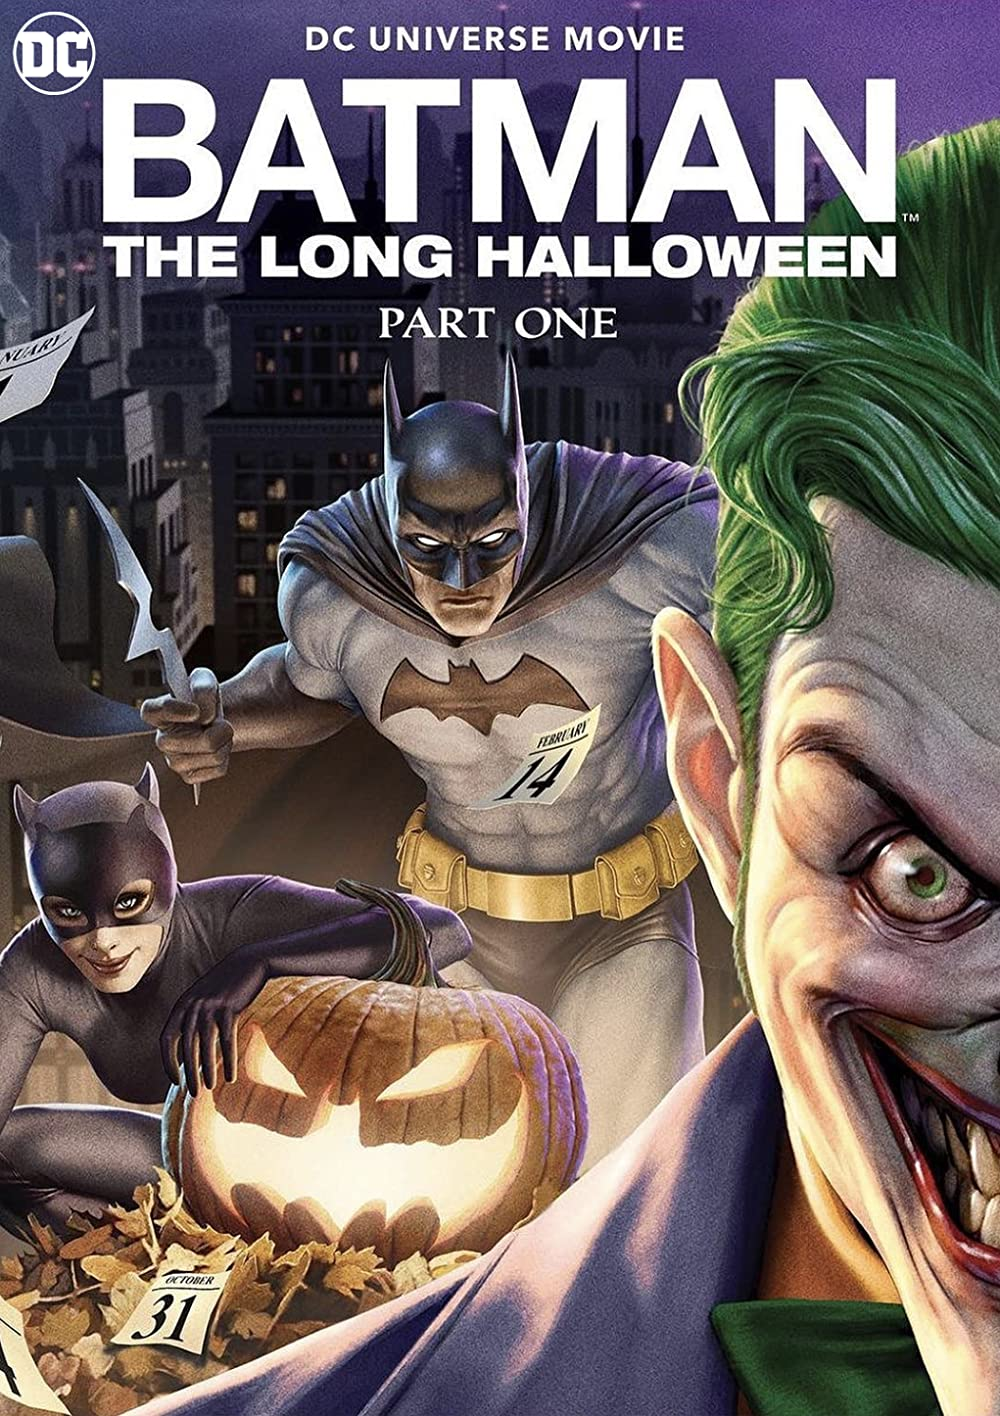 Batman The Long Halloween Part One 2021 English 480p BluRay 274MB Download